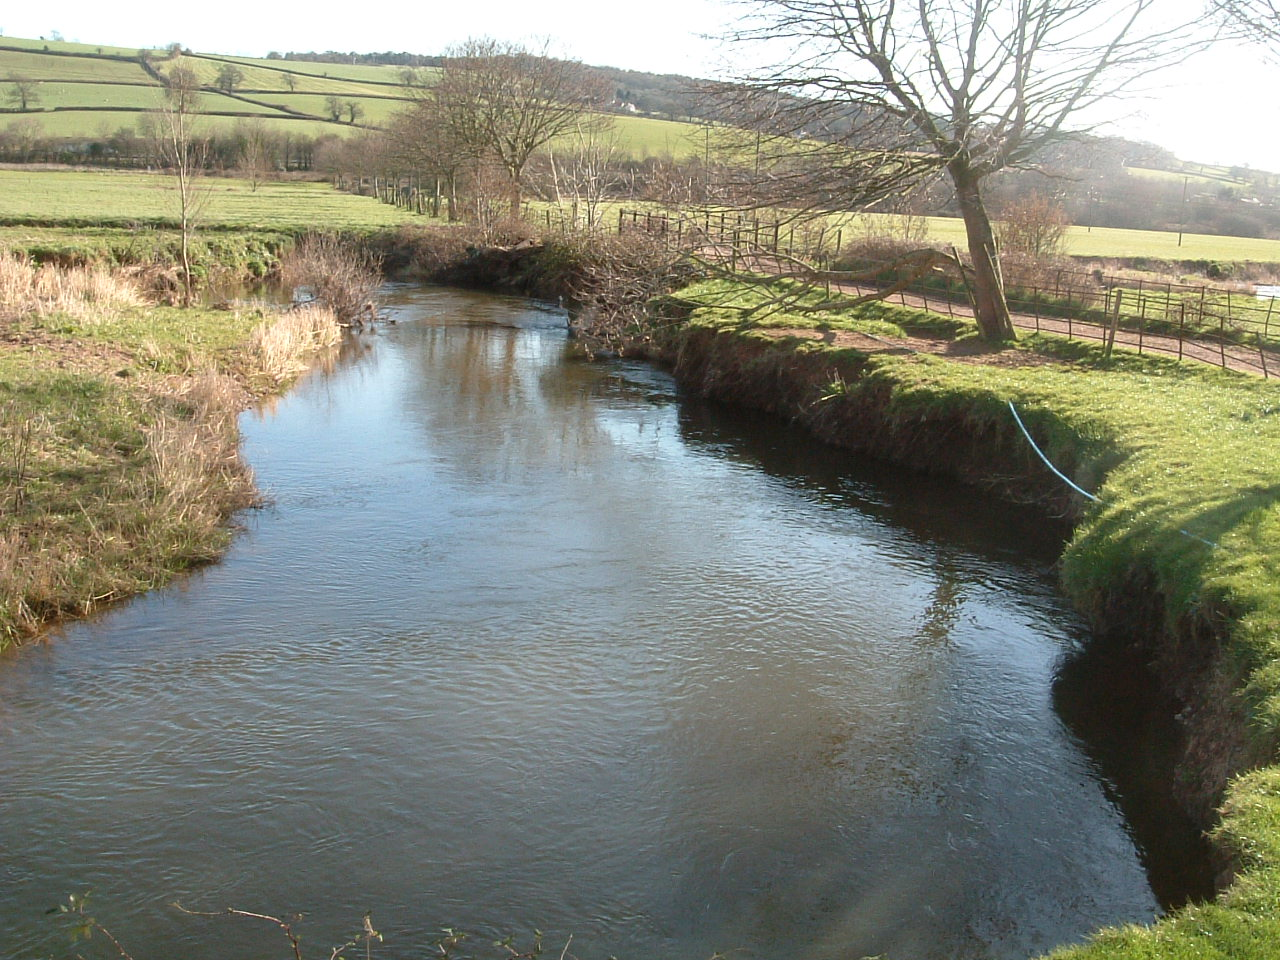 Eroded riverbank